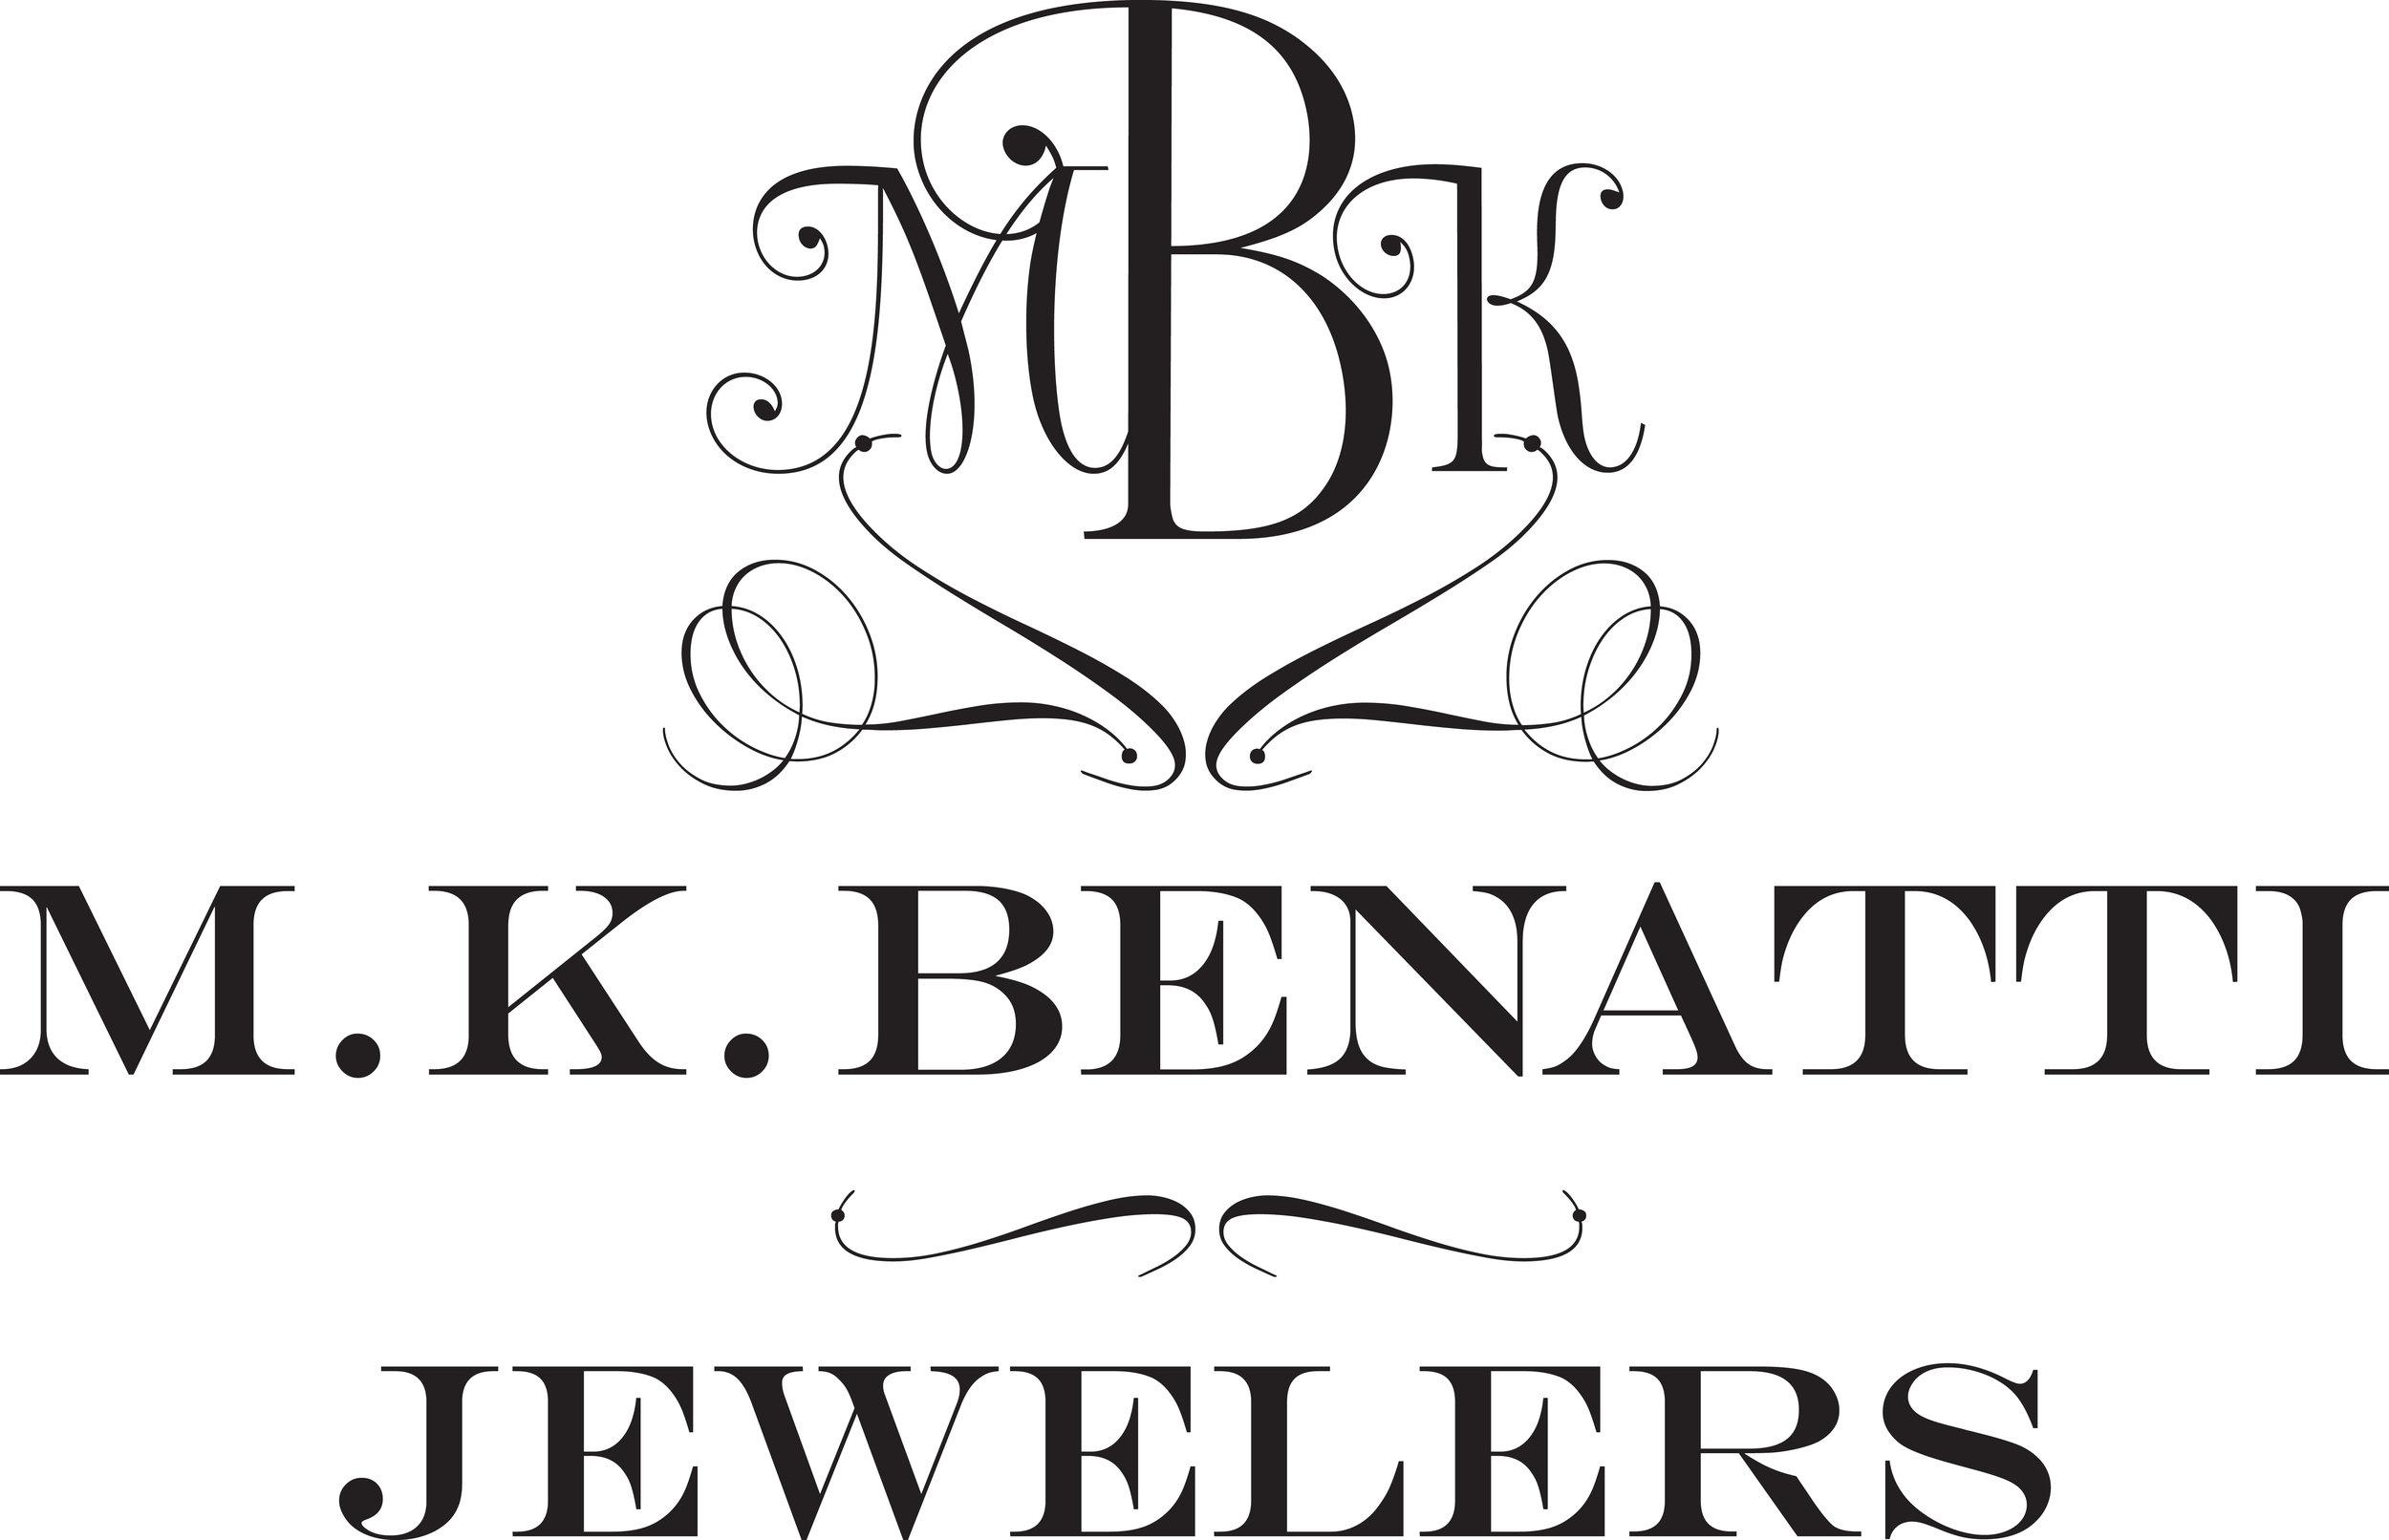 Benatti logo hi-res.jpg